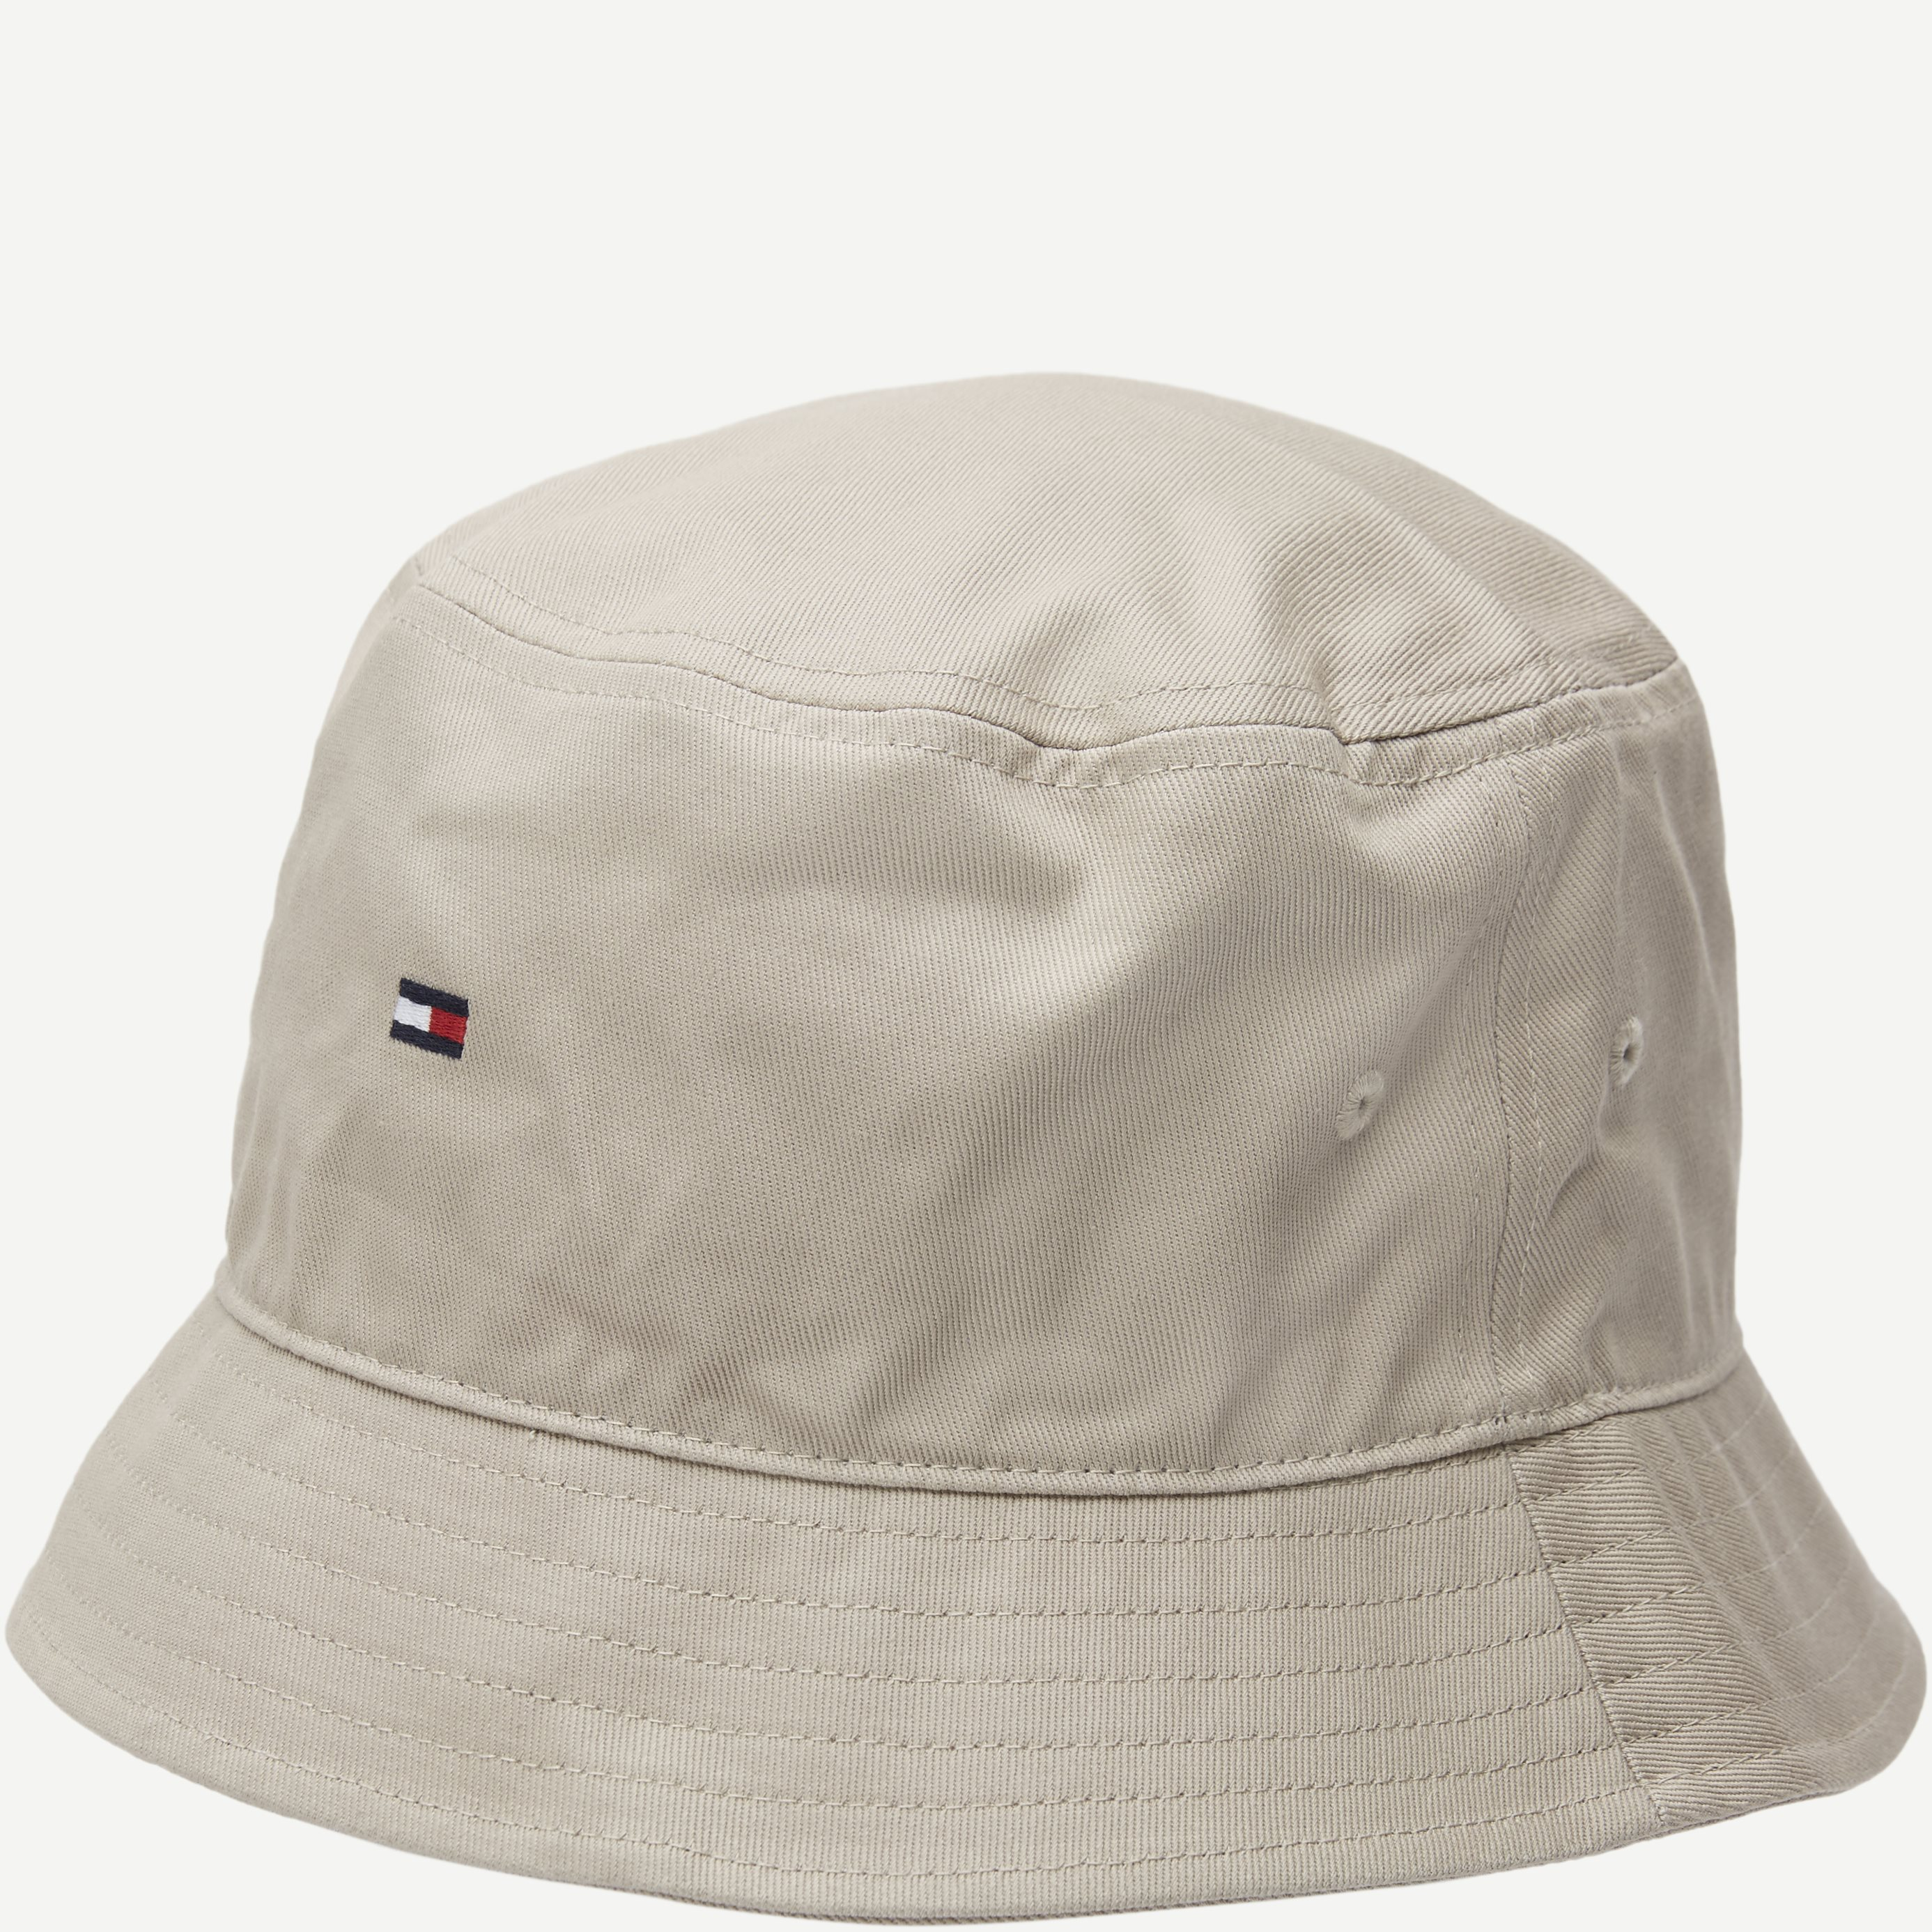 Flag Bucket Hat - Hatte - Sand